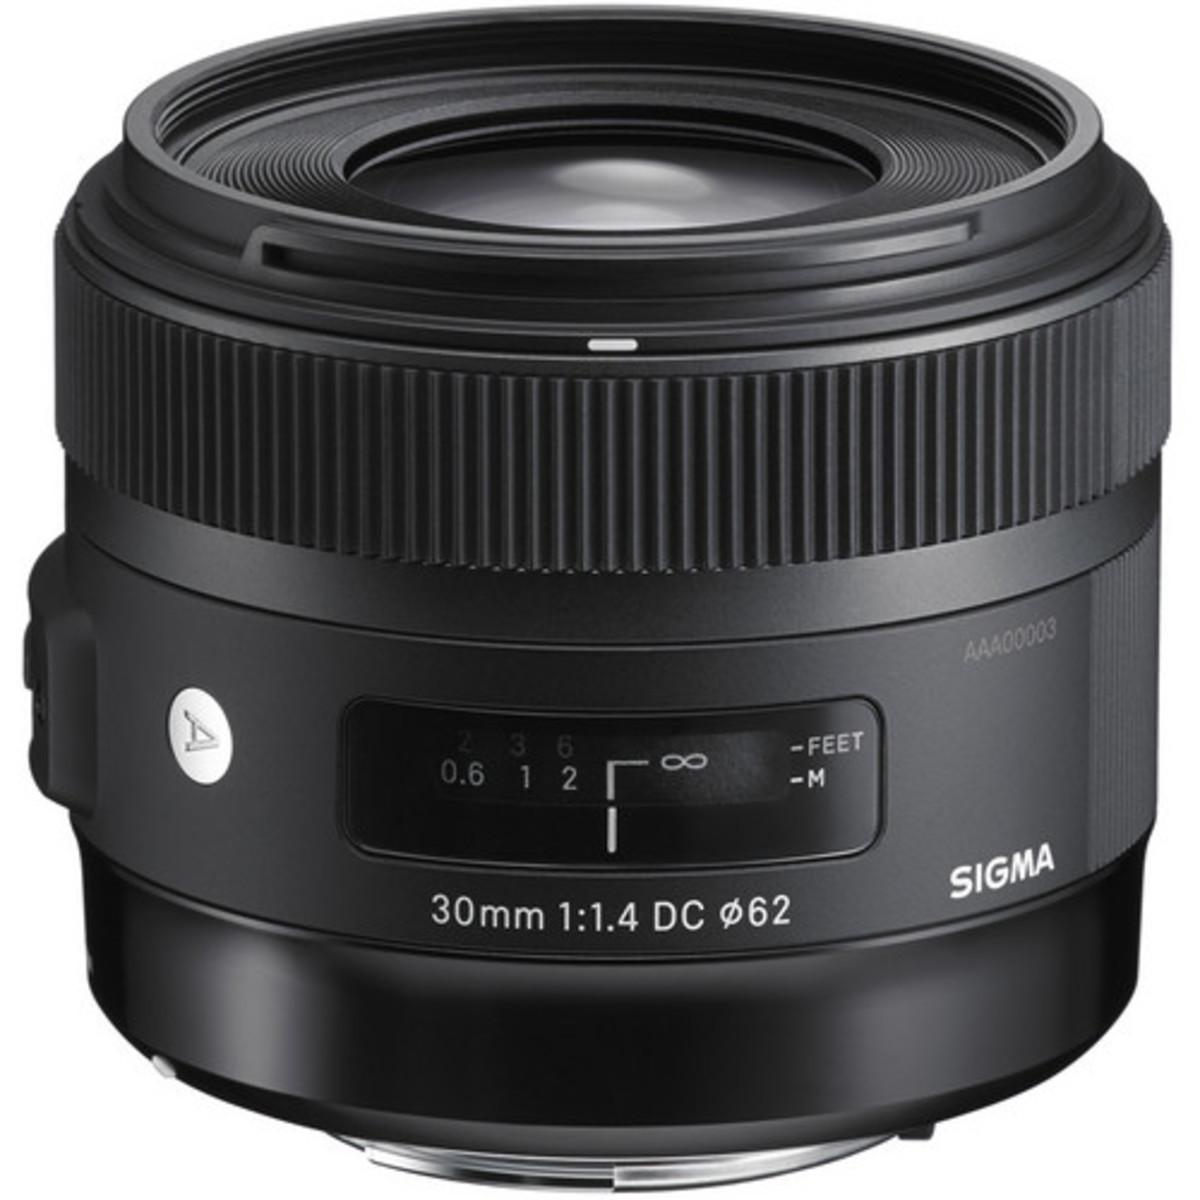 Sigma 30mm f/1.4 DC HSM Art Lens - [For Canon] (平行進口)